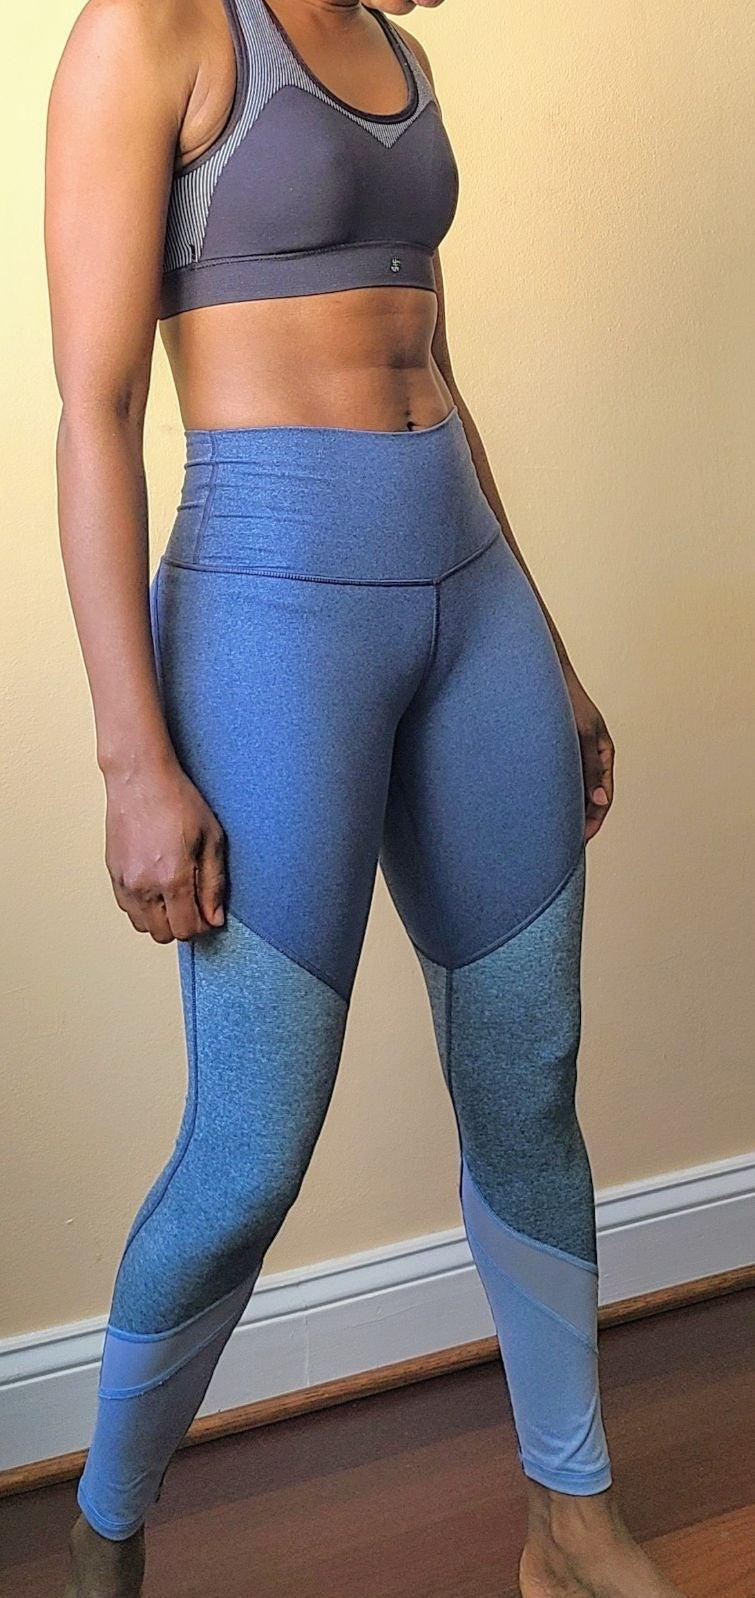 Aerie block color mesh size XS leggings